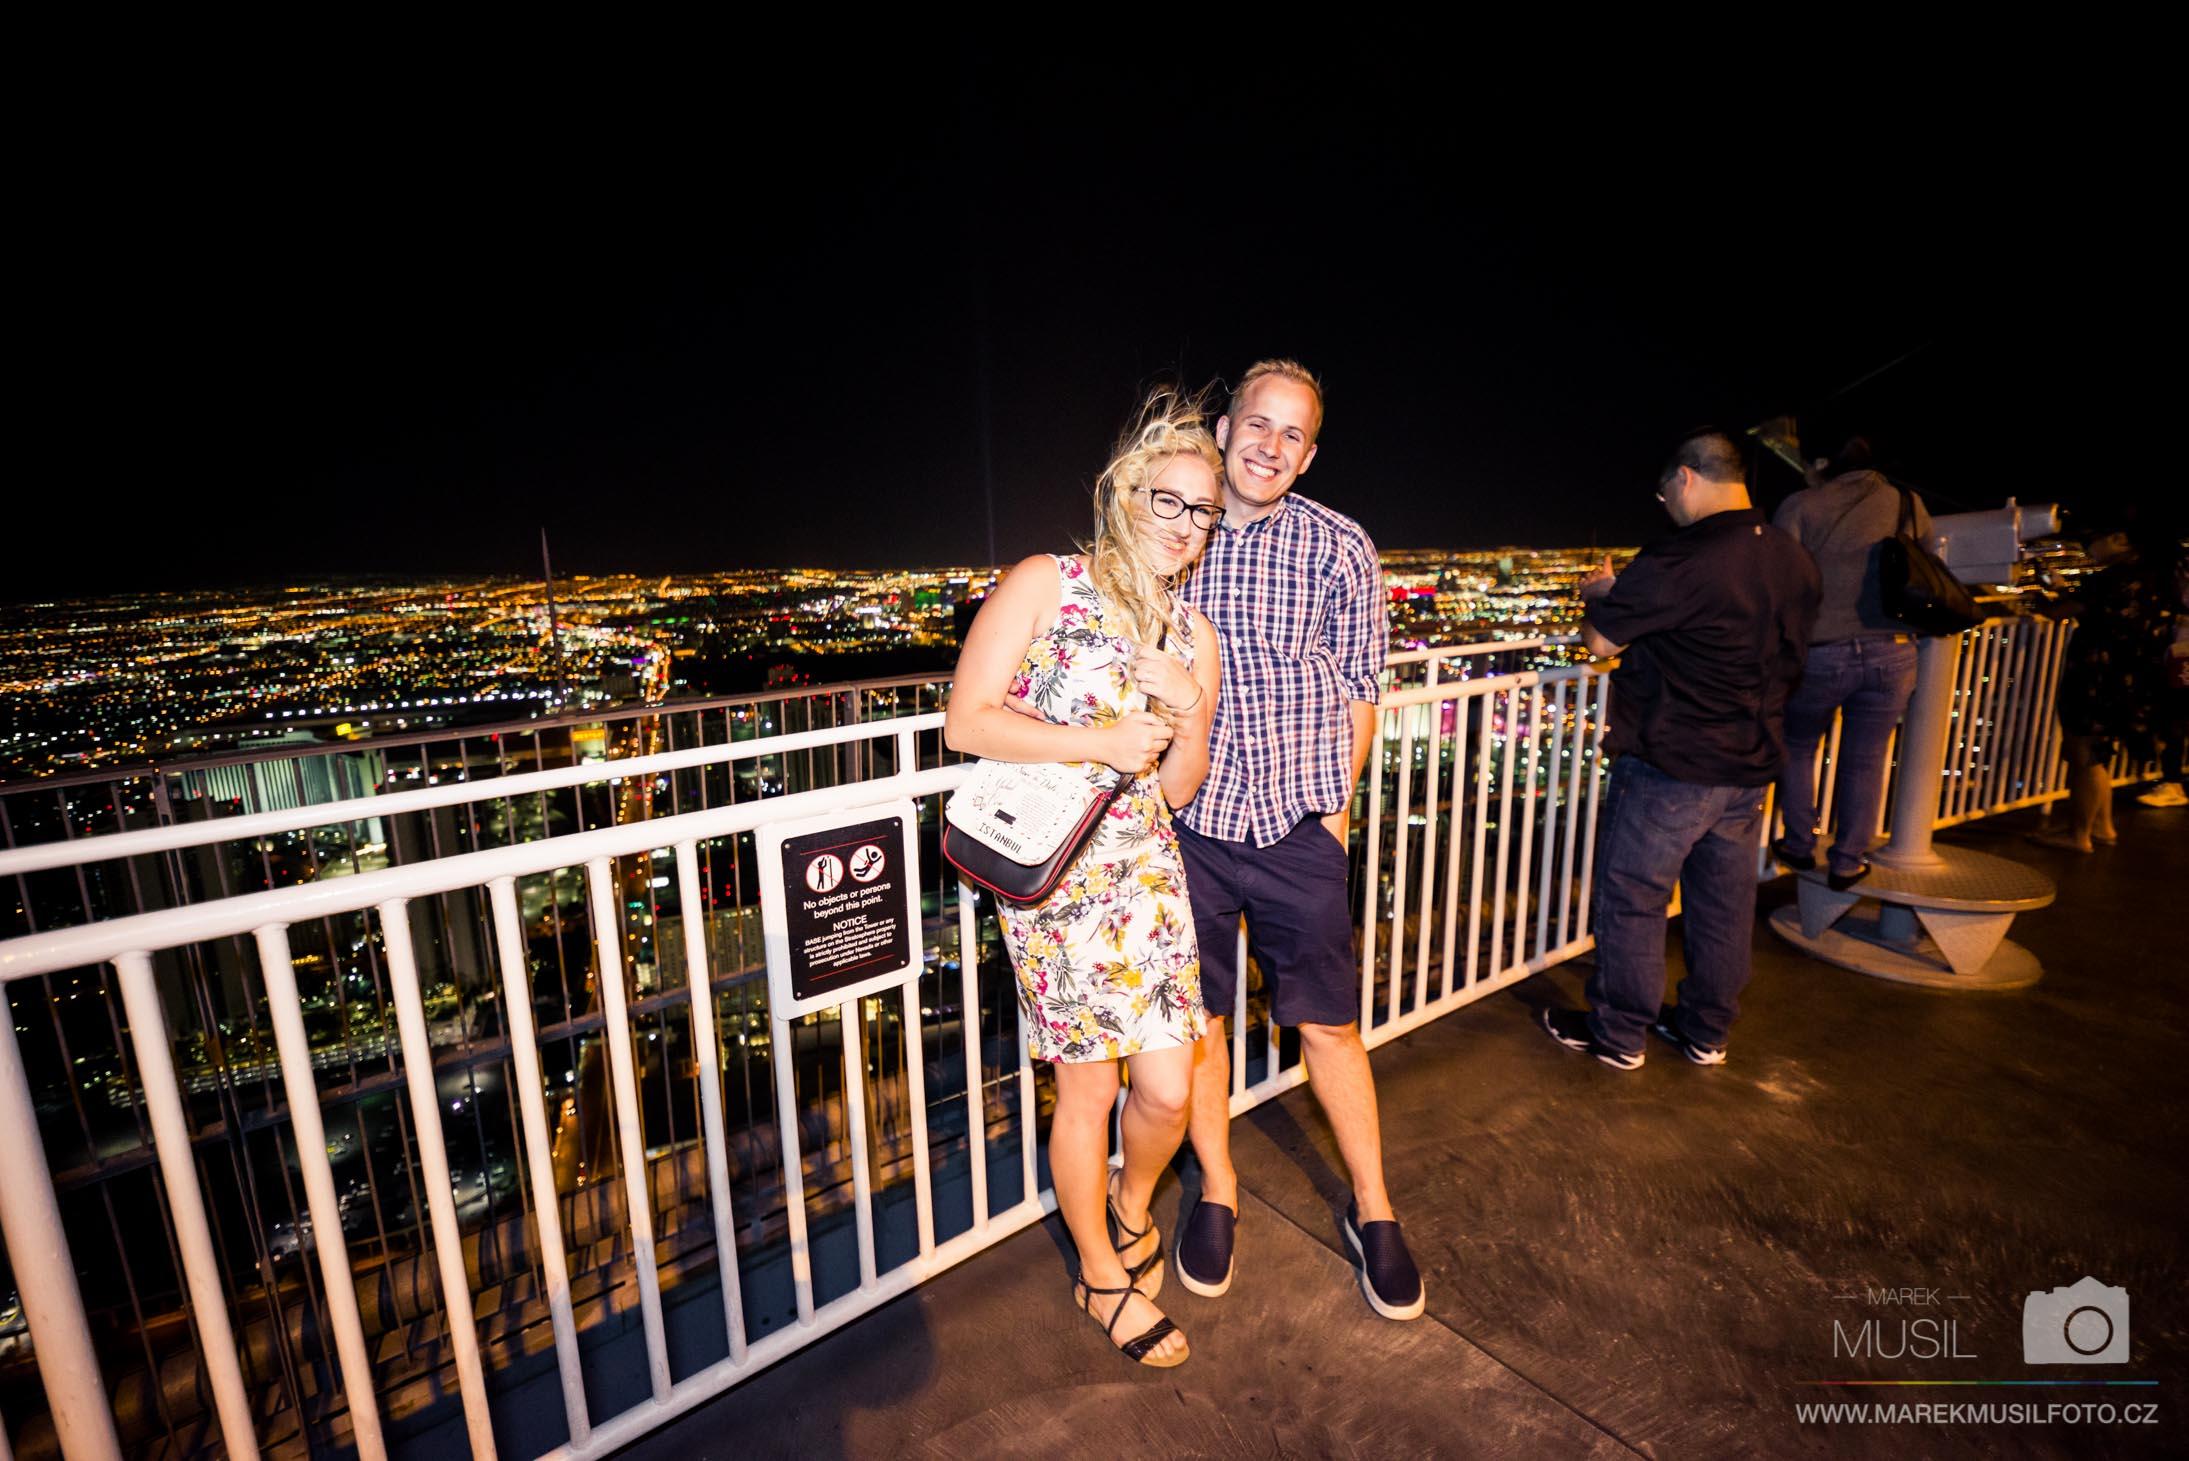 Las Vegas Stratosphere Tower